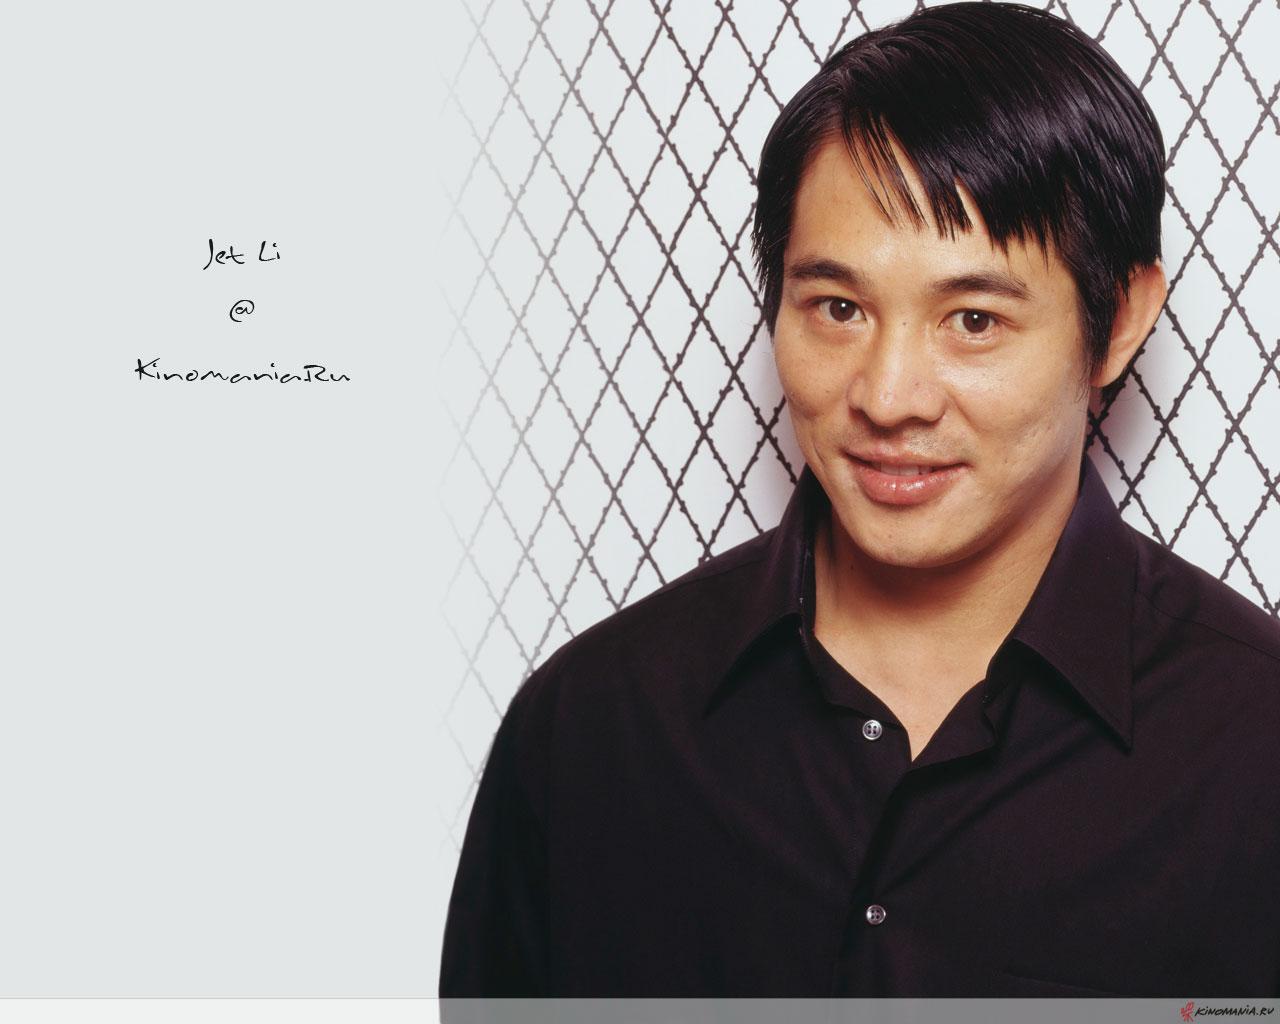 Berikut beberapa koleksi foto Jet Li: